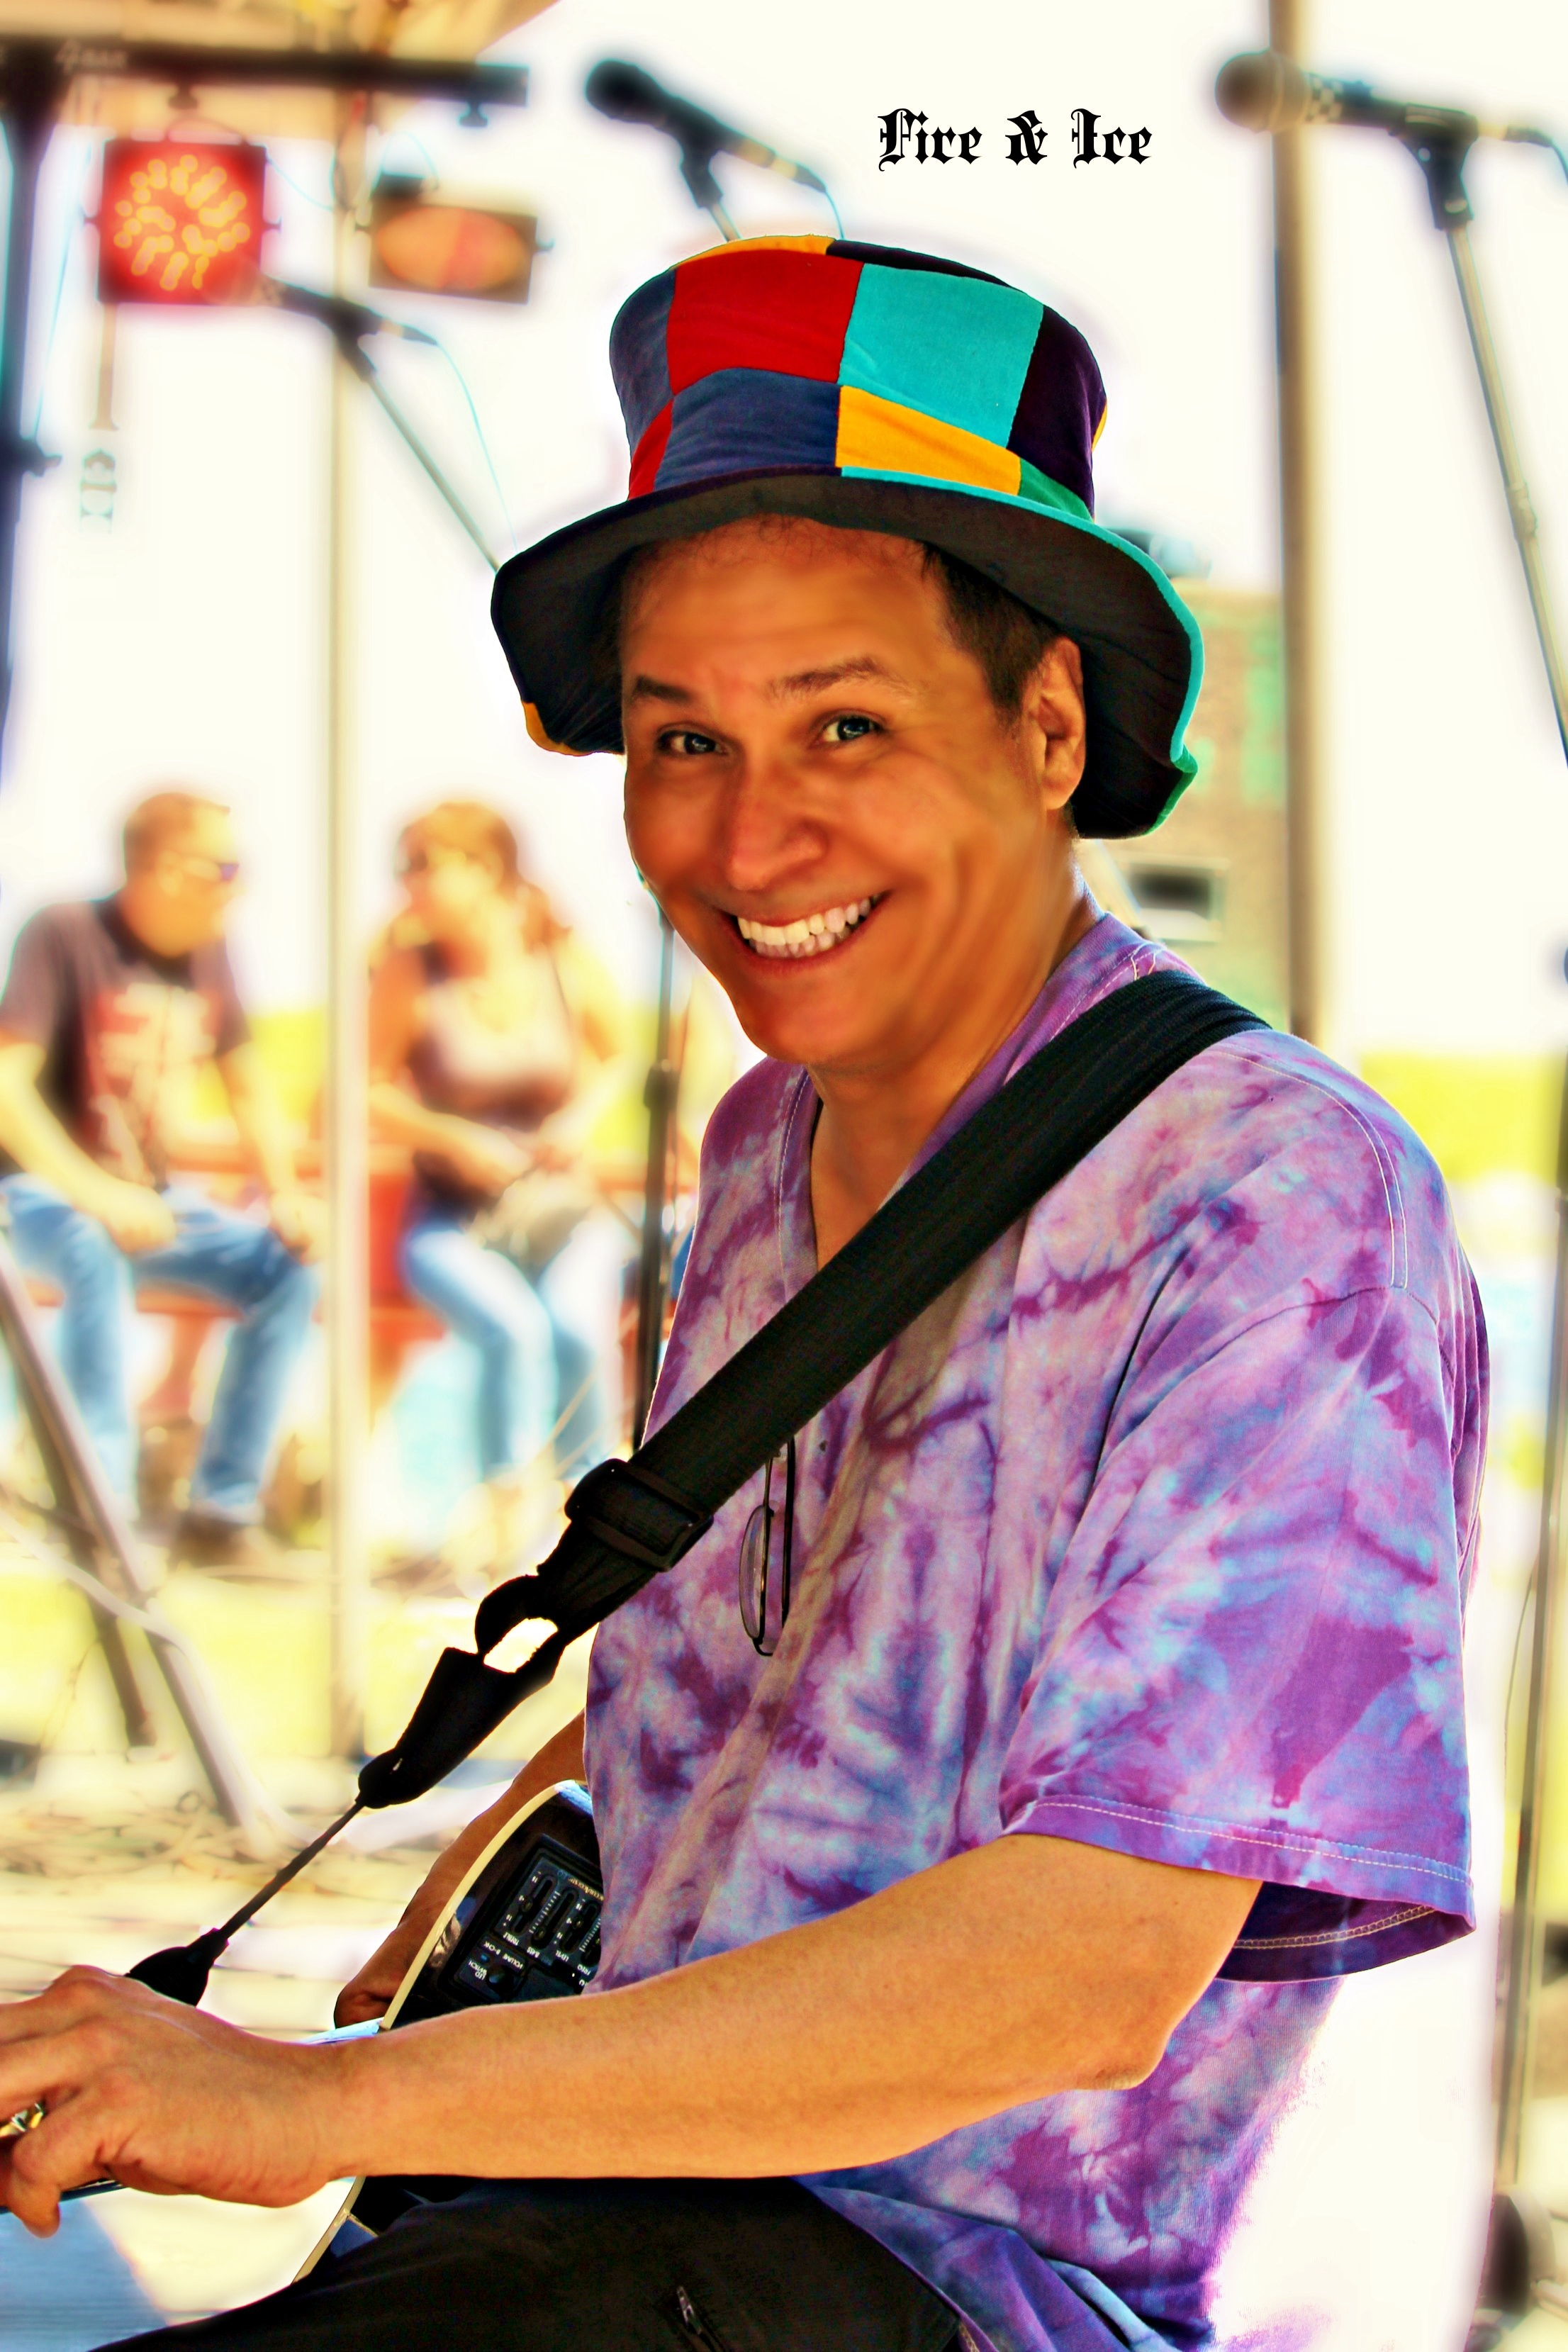 Mr. E at Summerfest